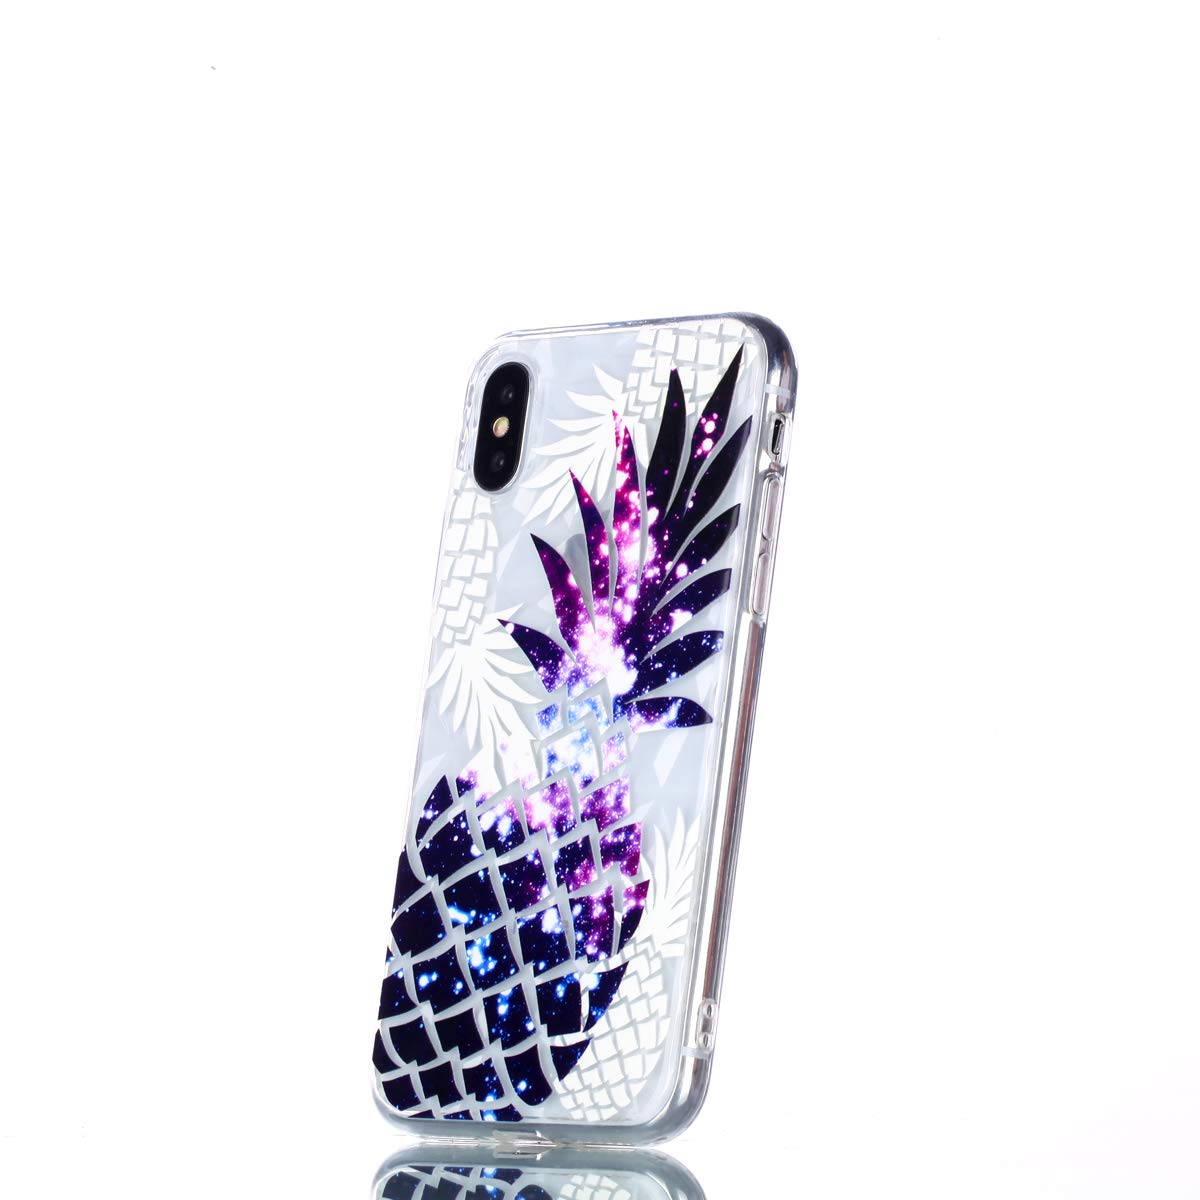 Felfy Kompatibel mit iPhone X//XS H/ülle Silikon Transparent mit Mandala Muster Crystal Clear Ultra D/ünn Flexibel Silikon Durchsichtig Case Kratzfeste Protective Handytasche R/ückseite Etui